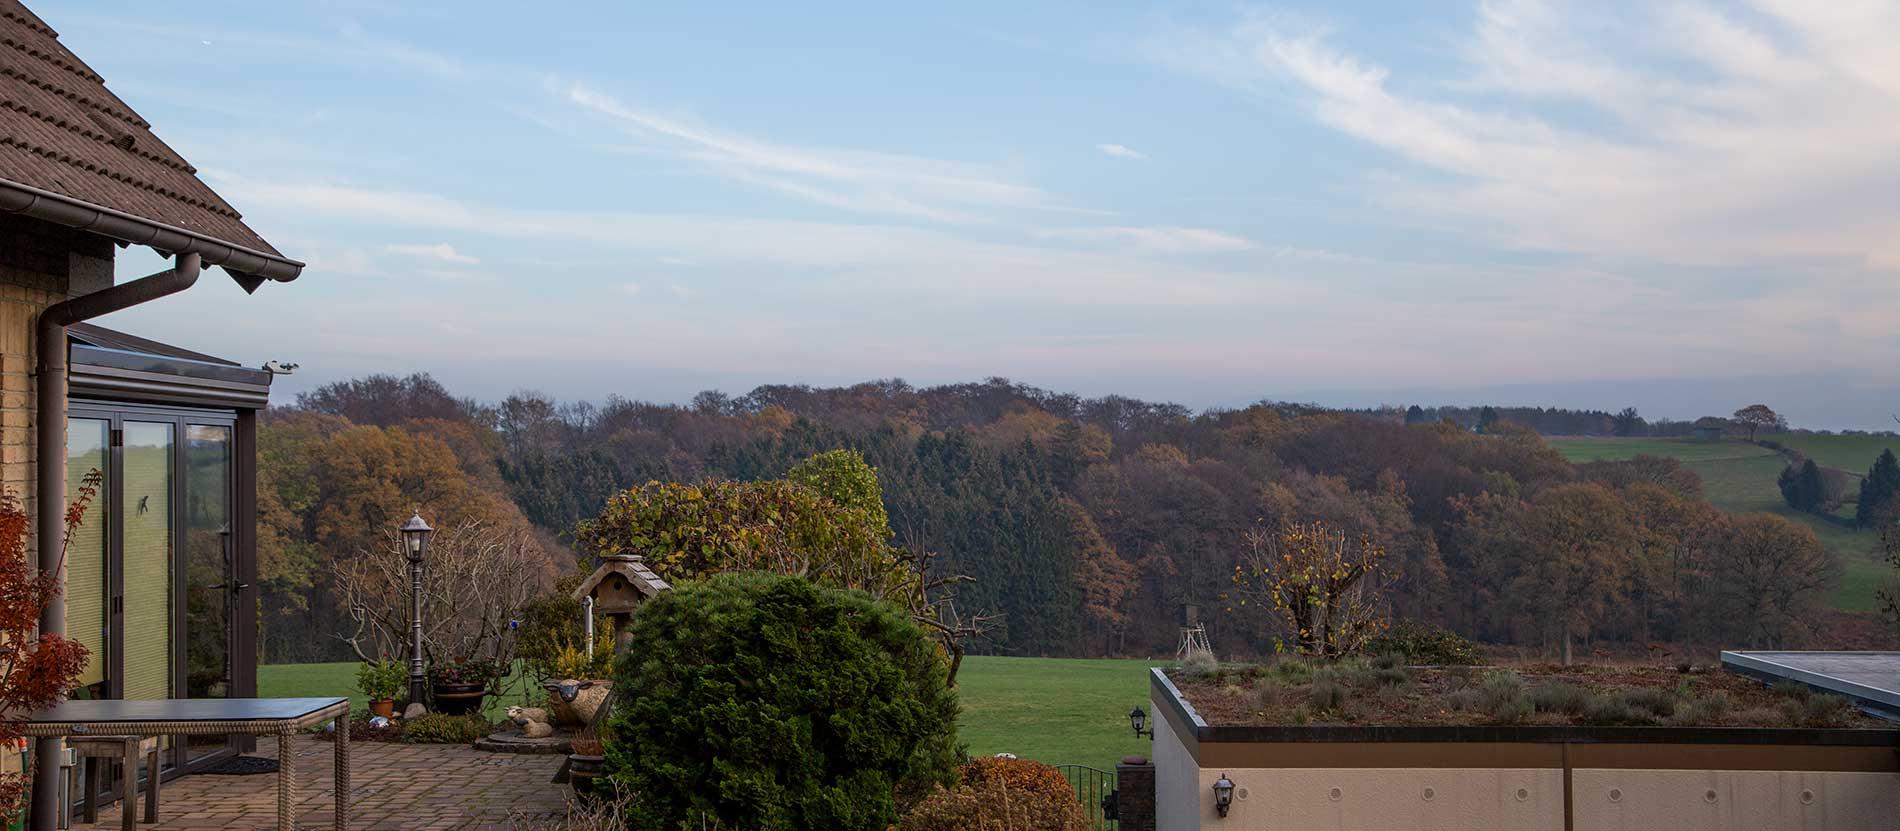 Einfamilienhaus mit Panoramablick